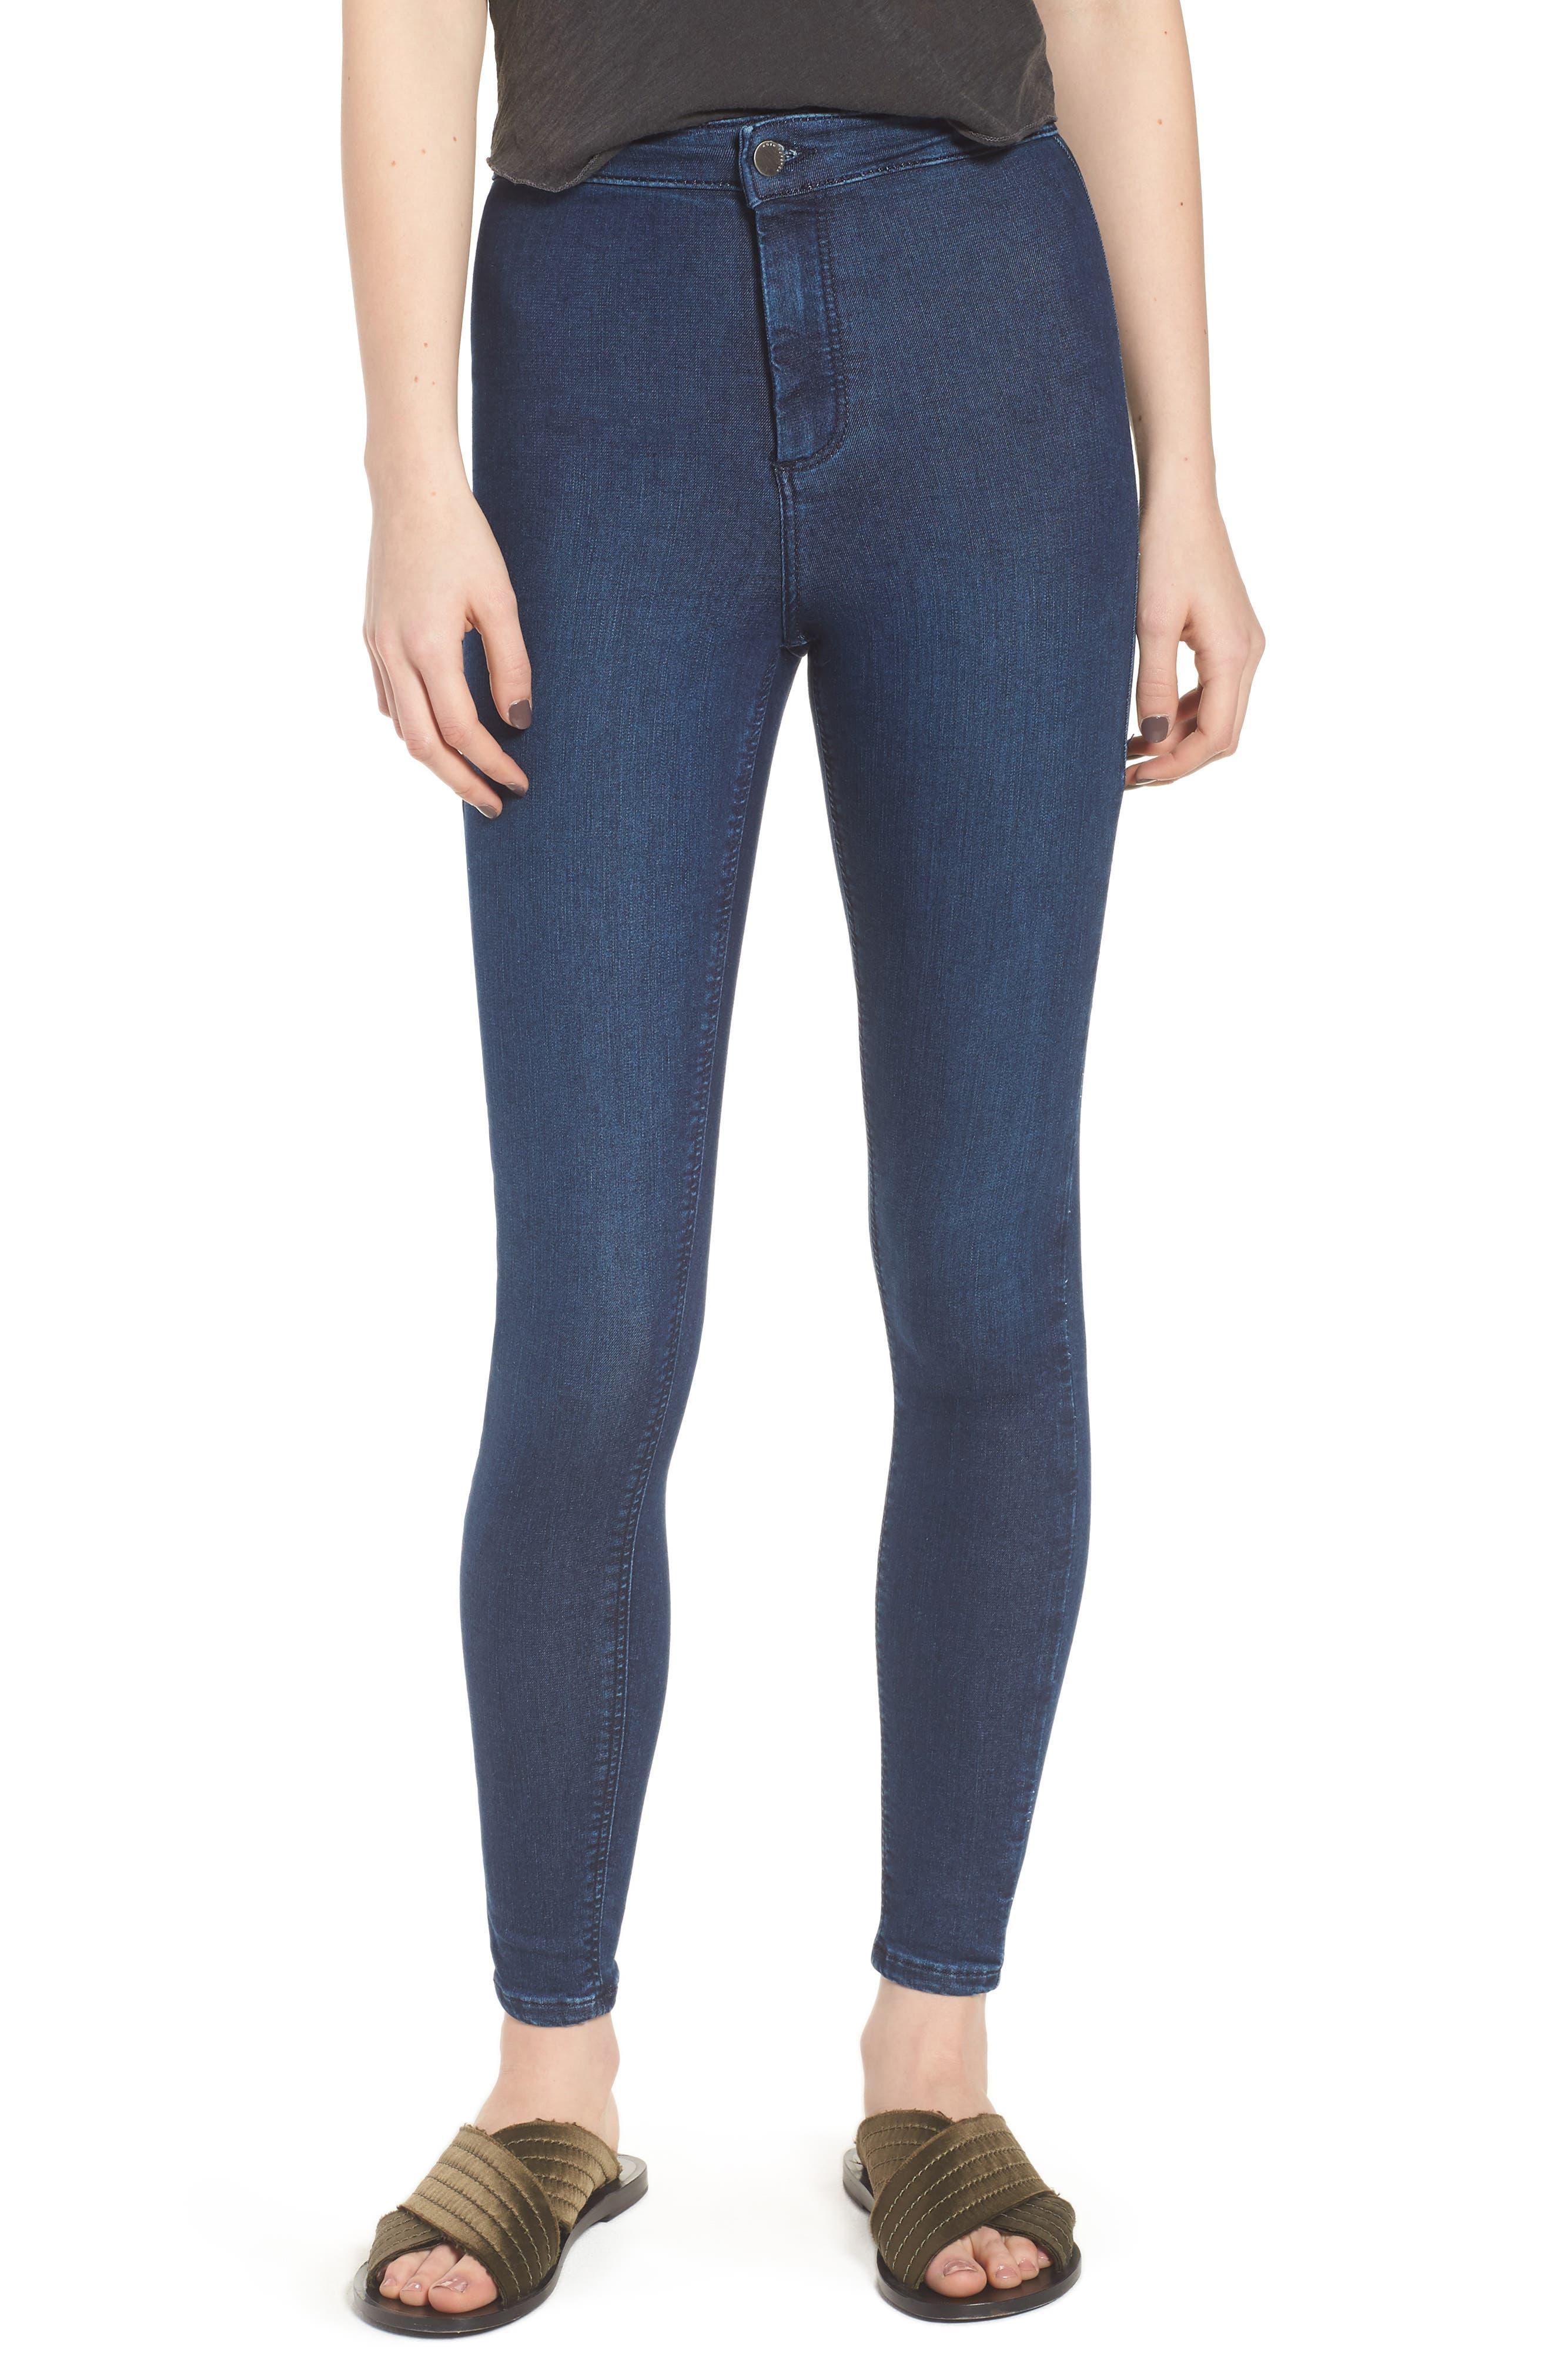 Main Image - Topshop Moto 'Joni' Super Skinny Jeans  (Regular & Short)